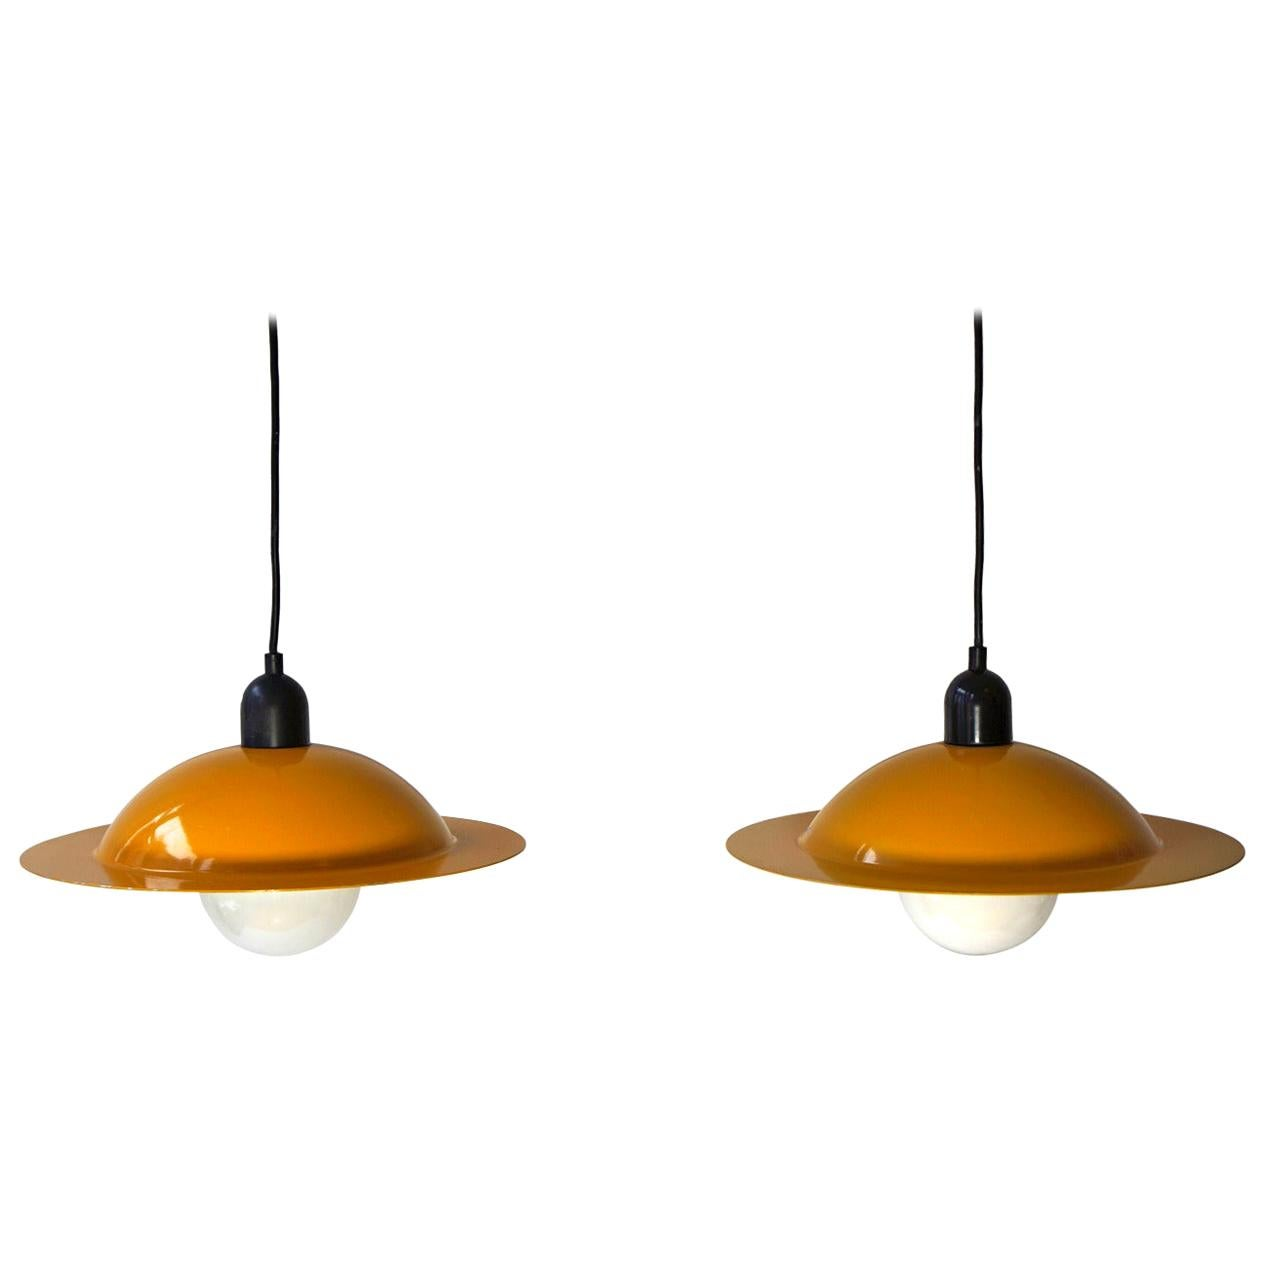 Italian Yellow Pendant Lights by Stilnovo